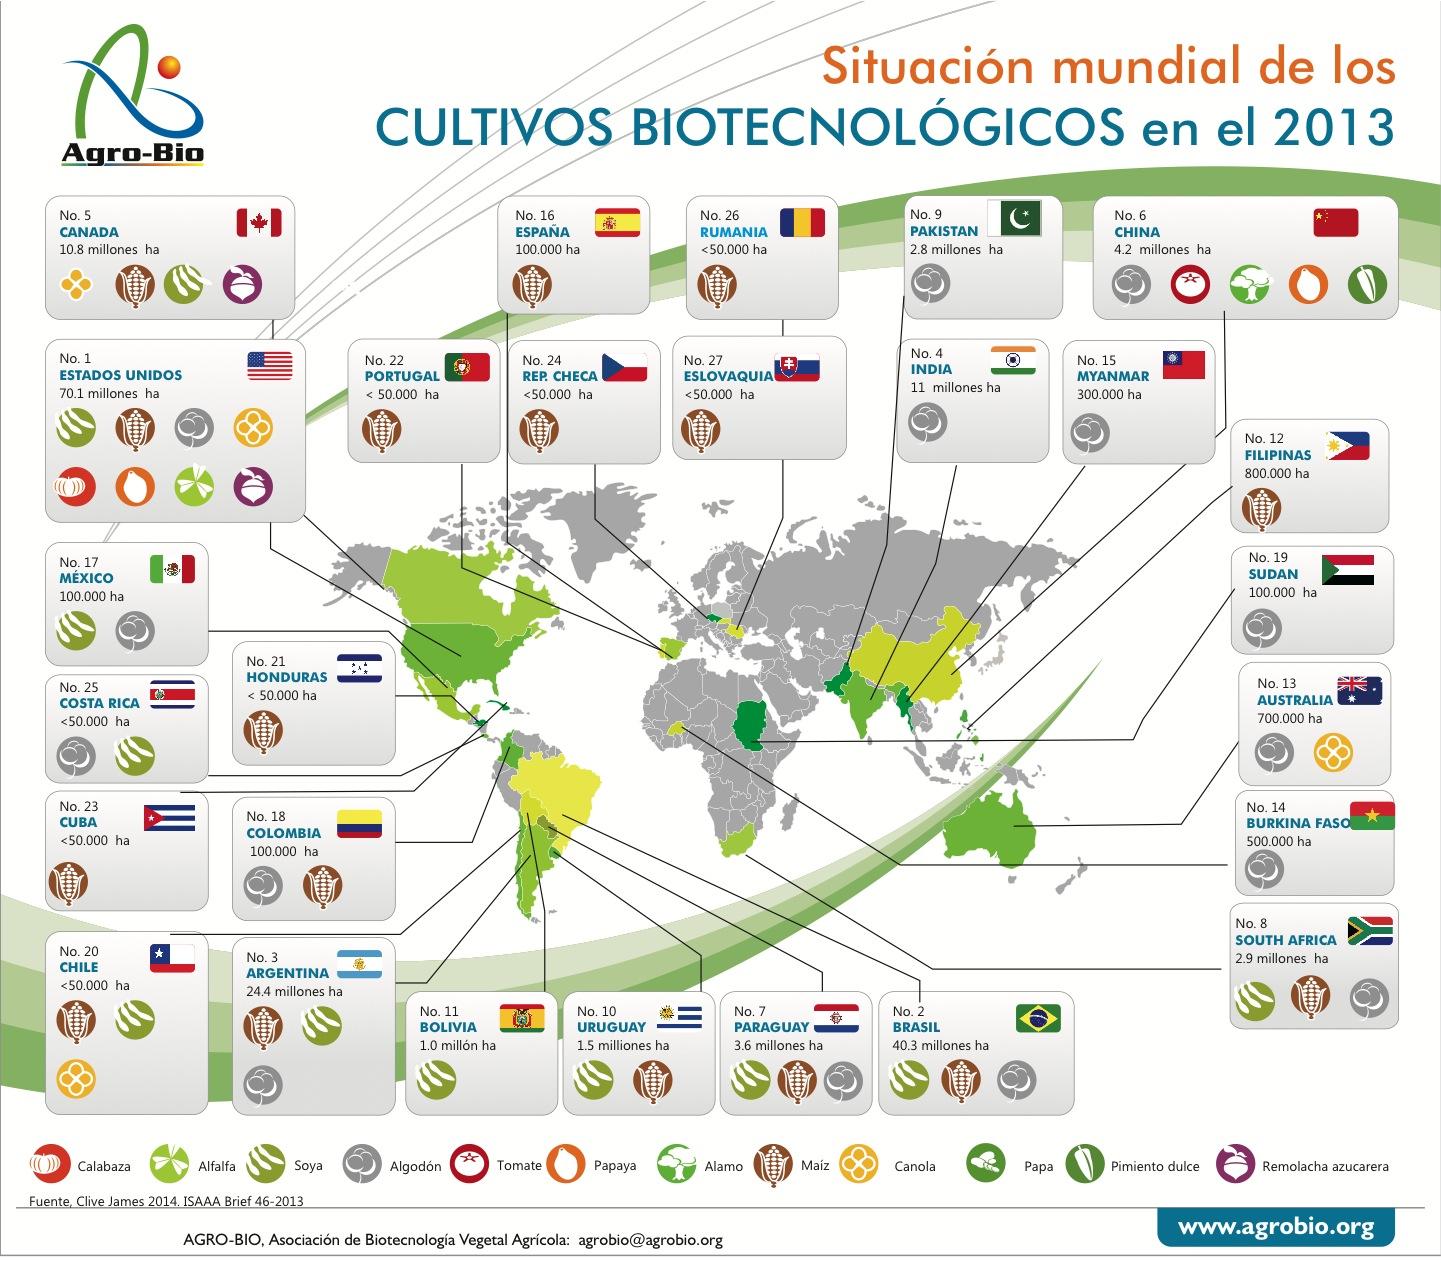 Agro-Bio_mapa_infografia_cultivos Biotec_mundial_2013_vf